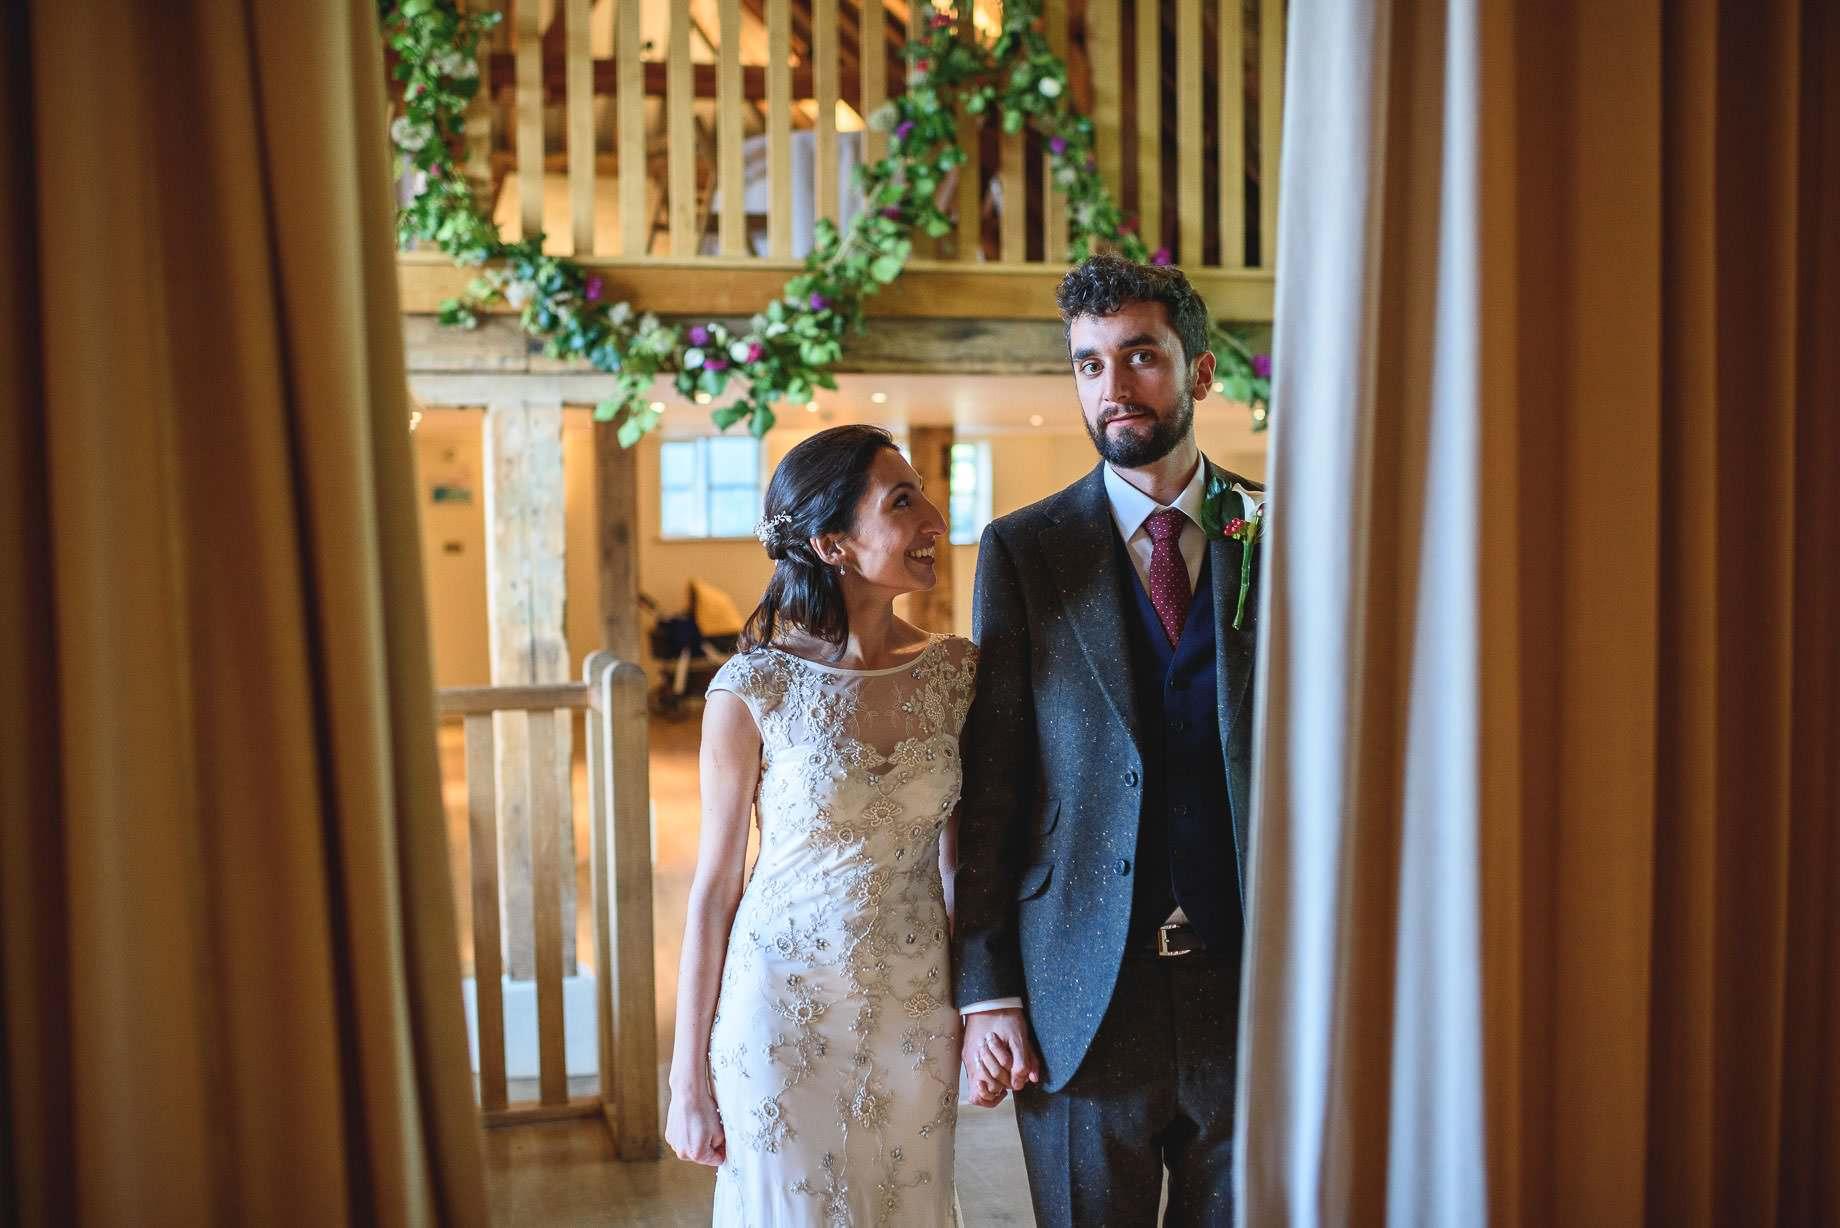 bury-court-barn-wedding-photography-guy-collier-photography-nadia-tom-142-of-184